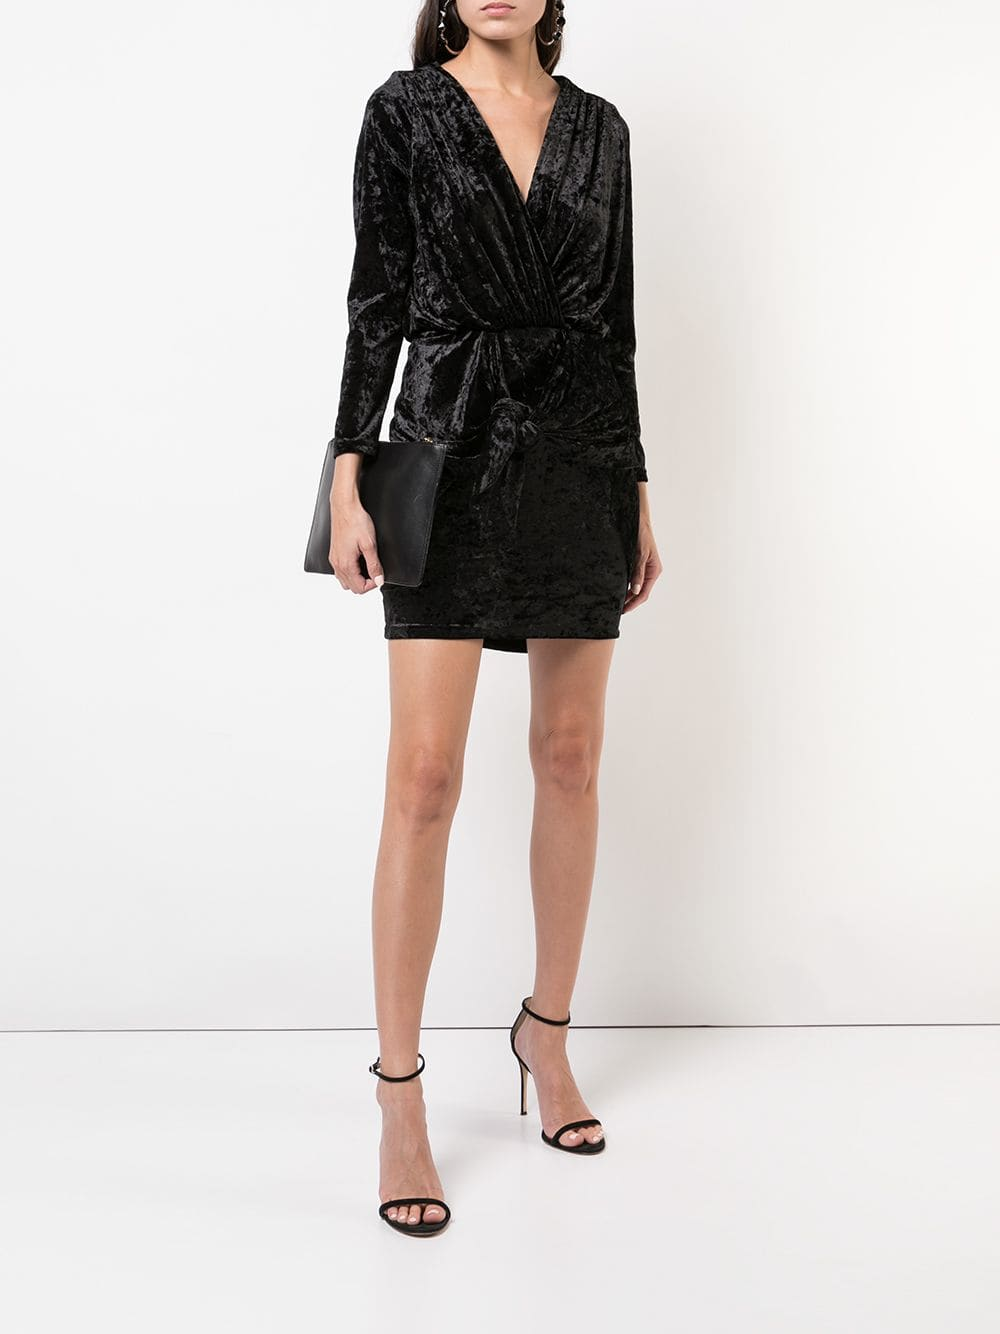 MISA LOS ANGELES Velvet Mini Black Dress